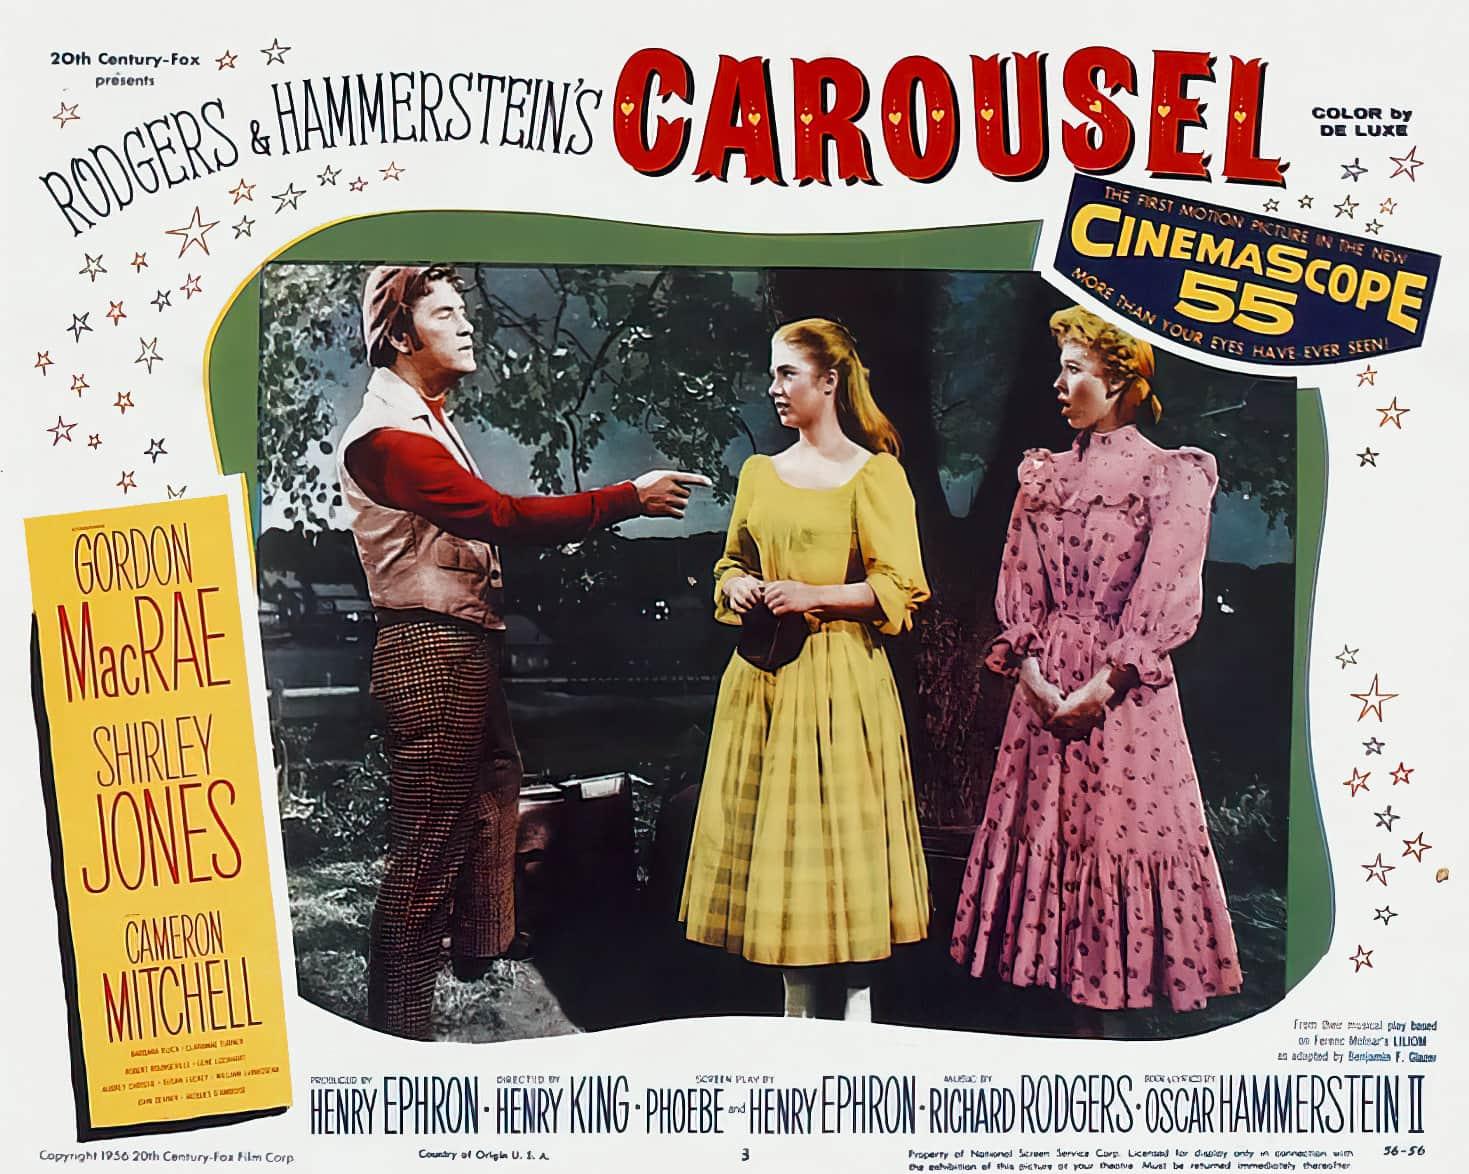 Vintage Carousel movie lobby card - 1950s (2)